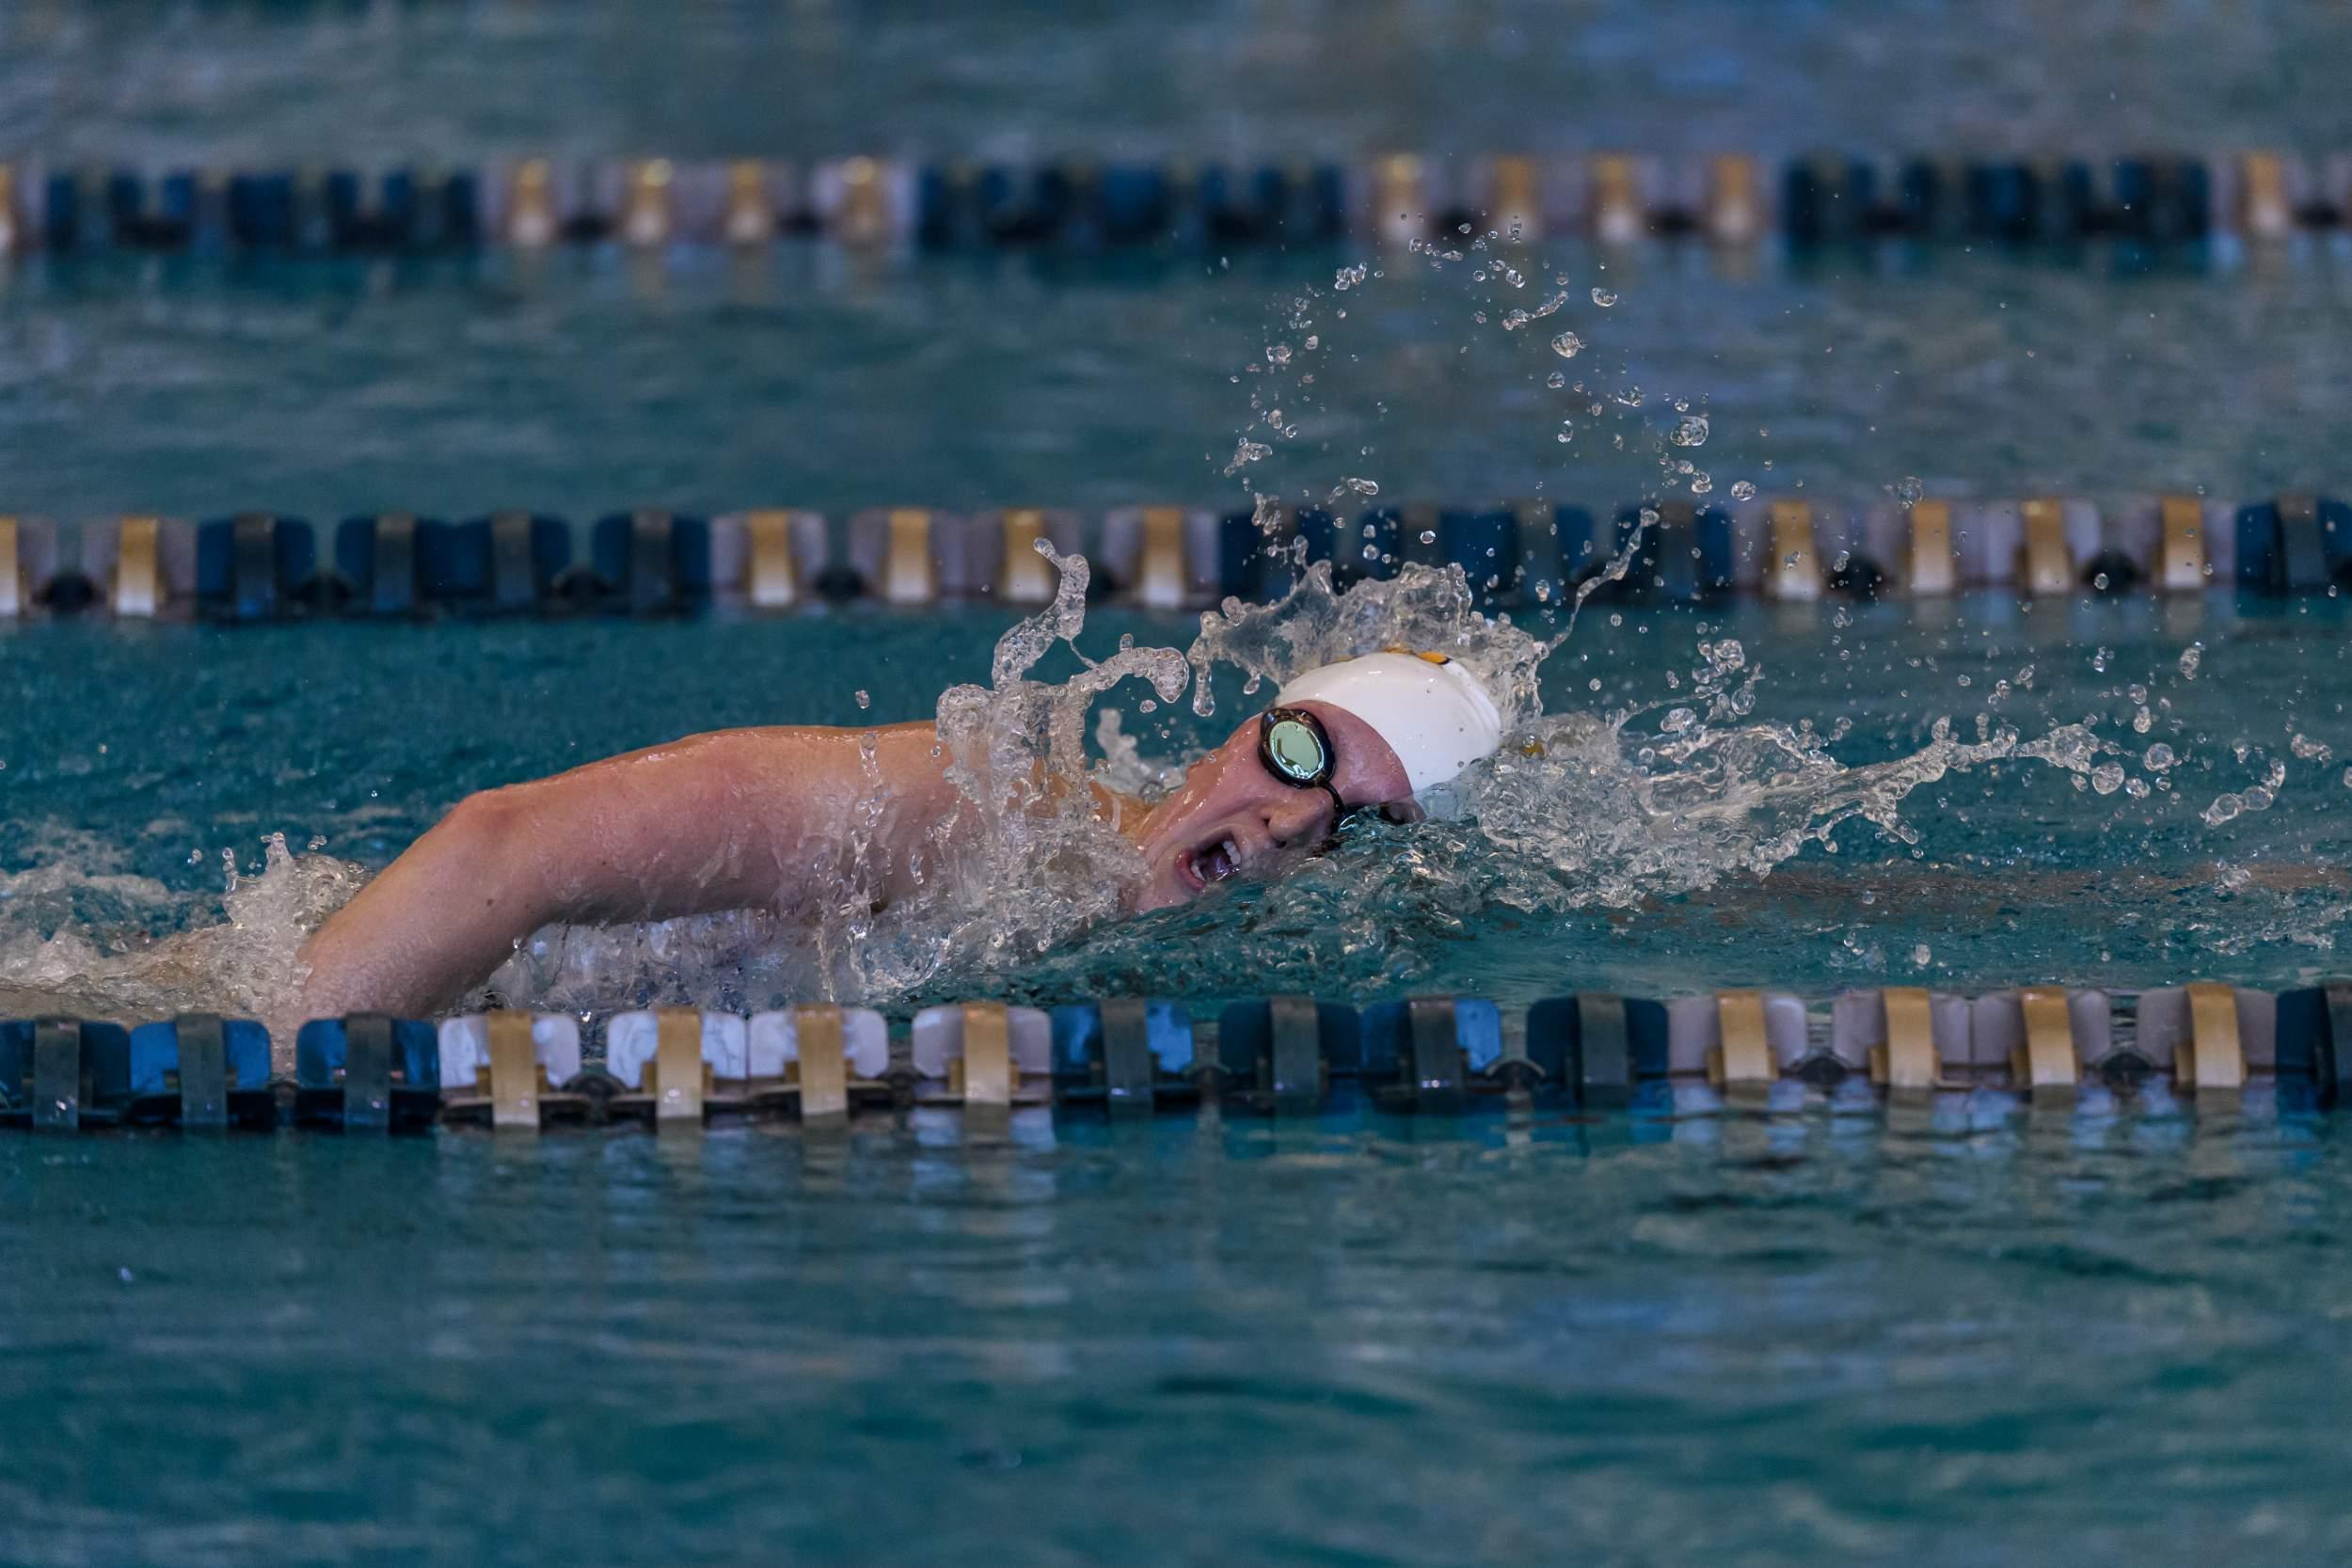 Ilgenfritz Qualifies for U.S. Olympic Trials